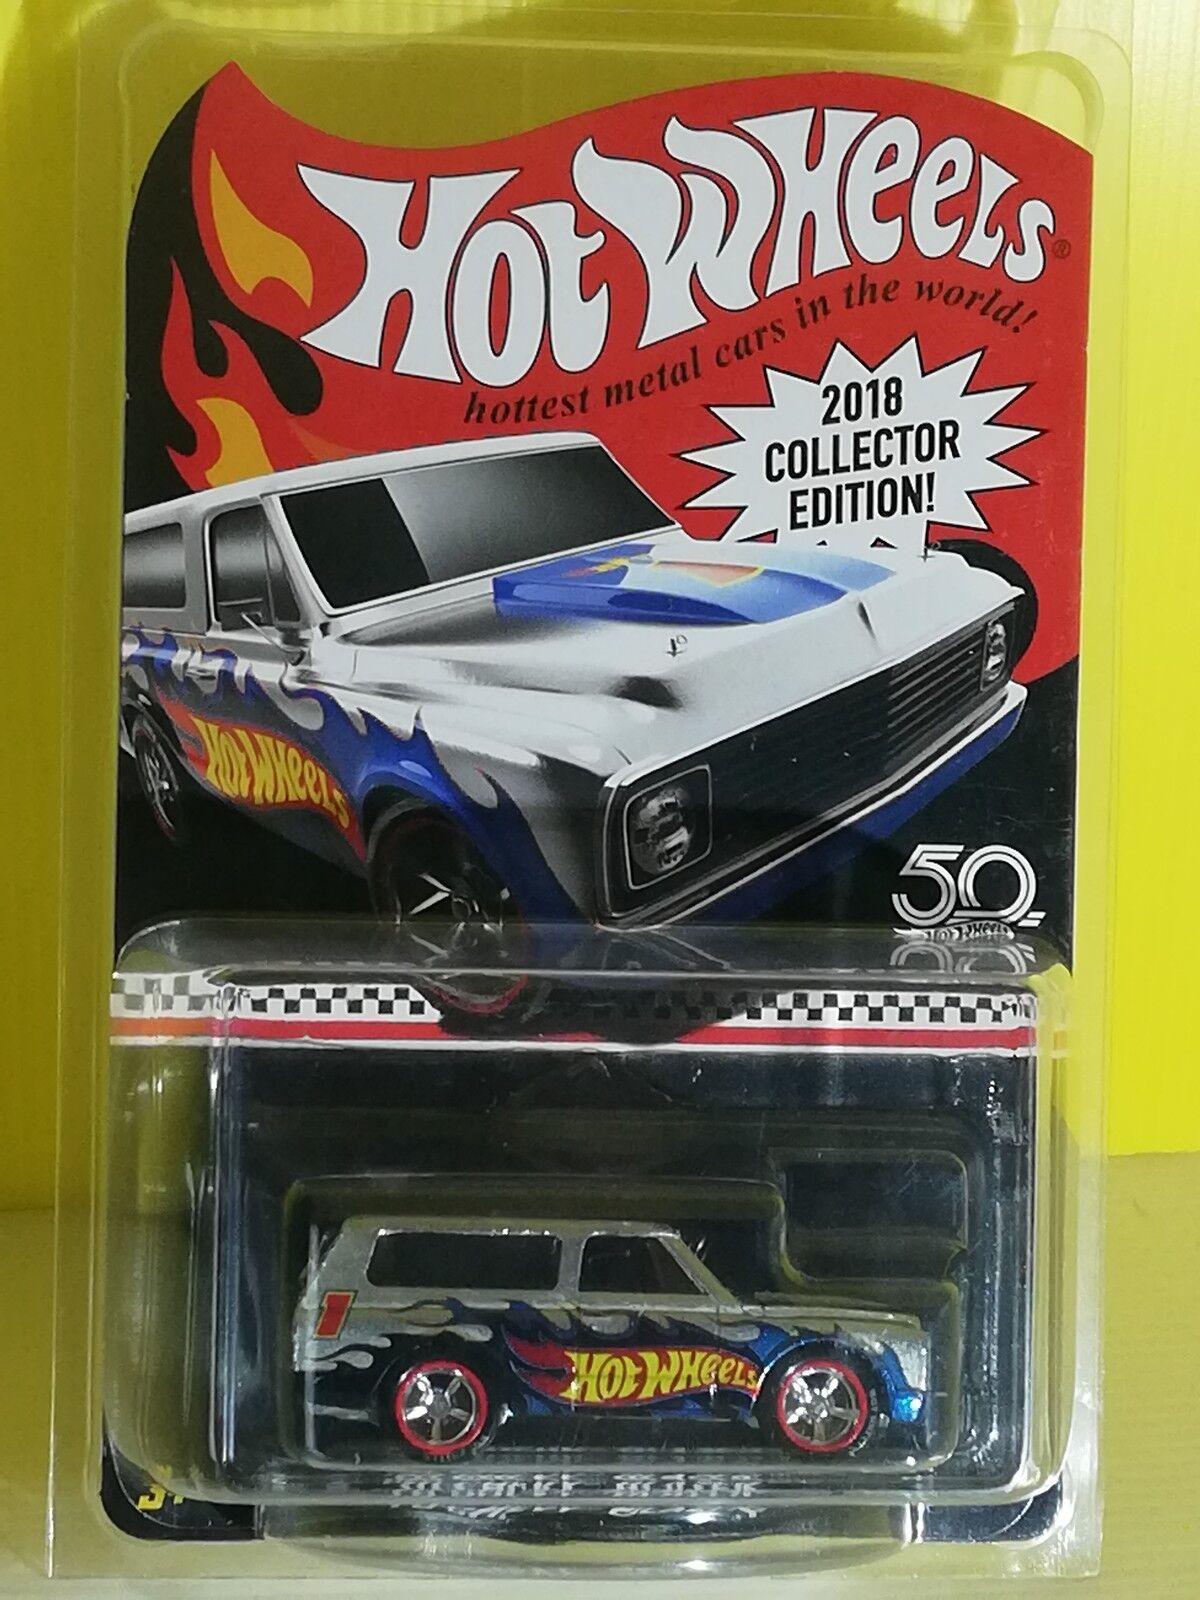 Hot Wheels '70 Chevy Blazer Exclusive 2018 Collector Edition